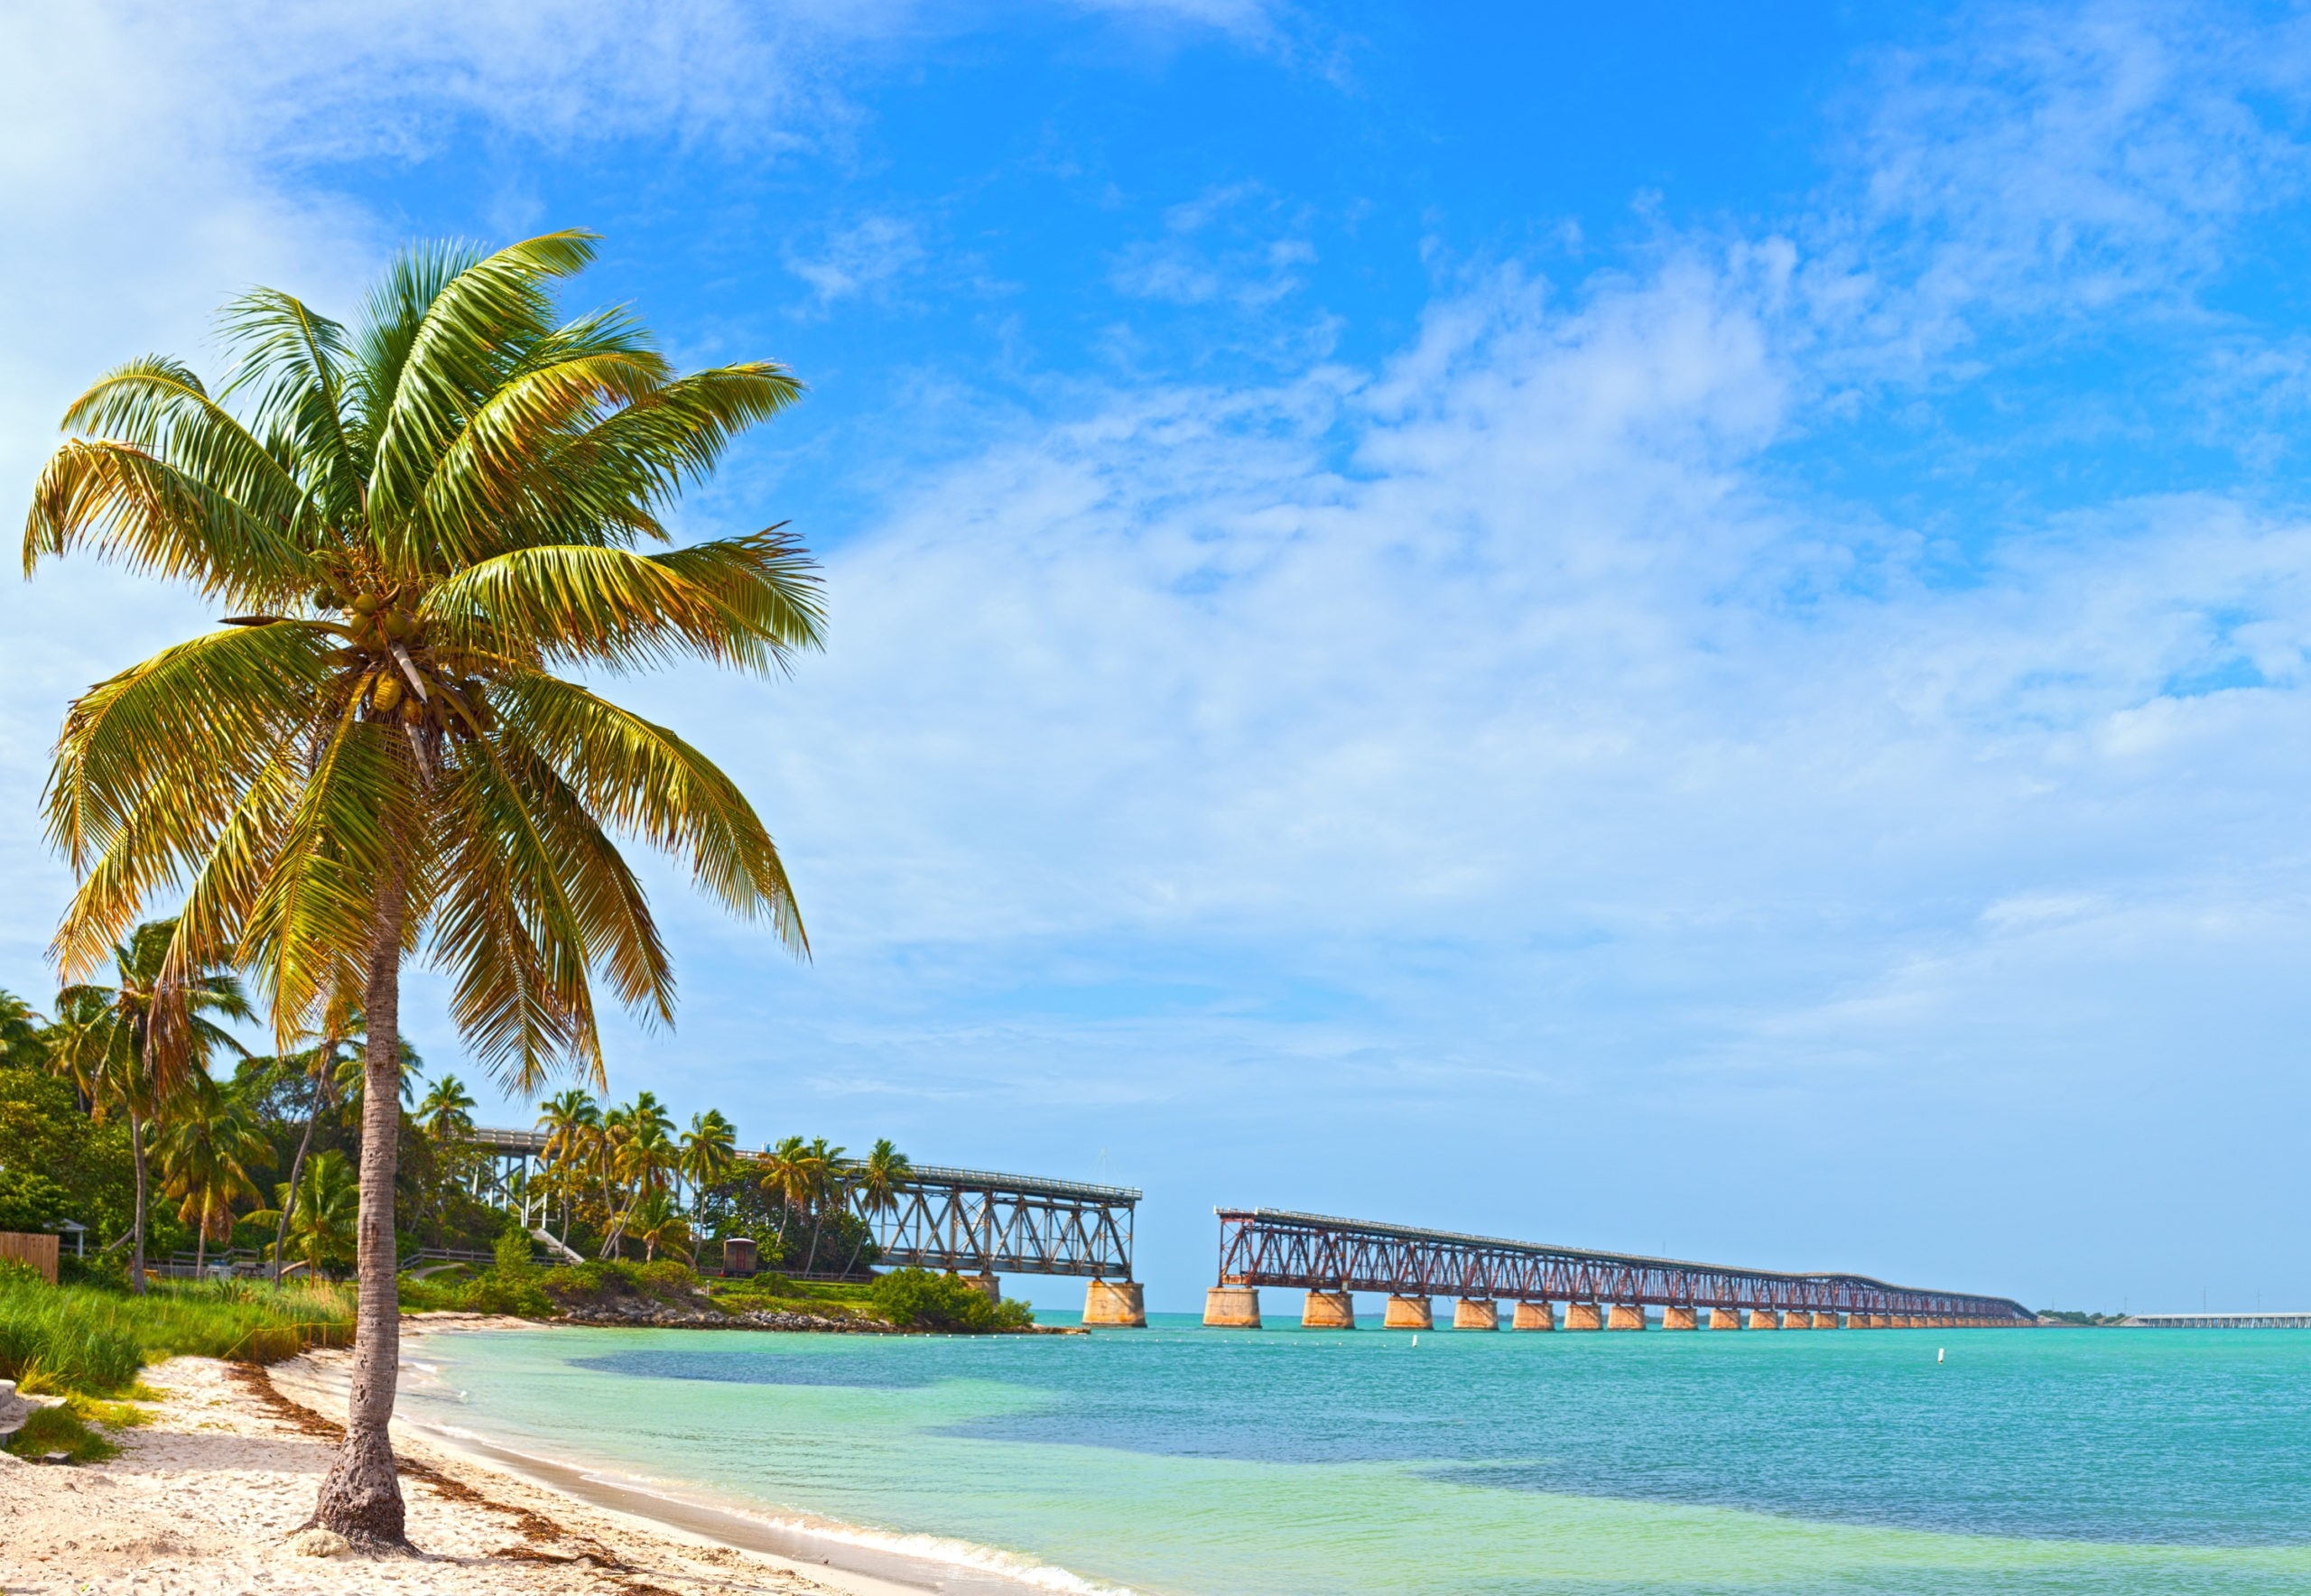 Bahia Honda State park, licencja: shutterstock/By fotomak